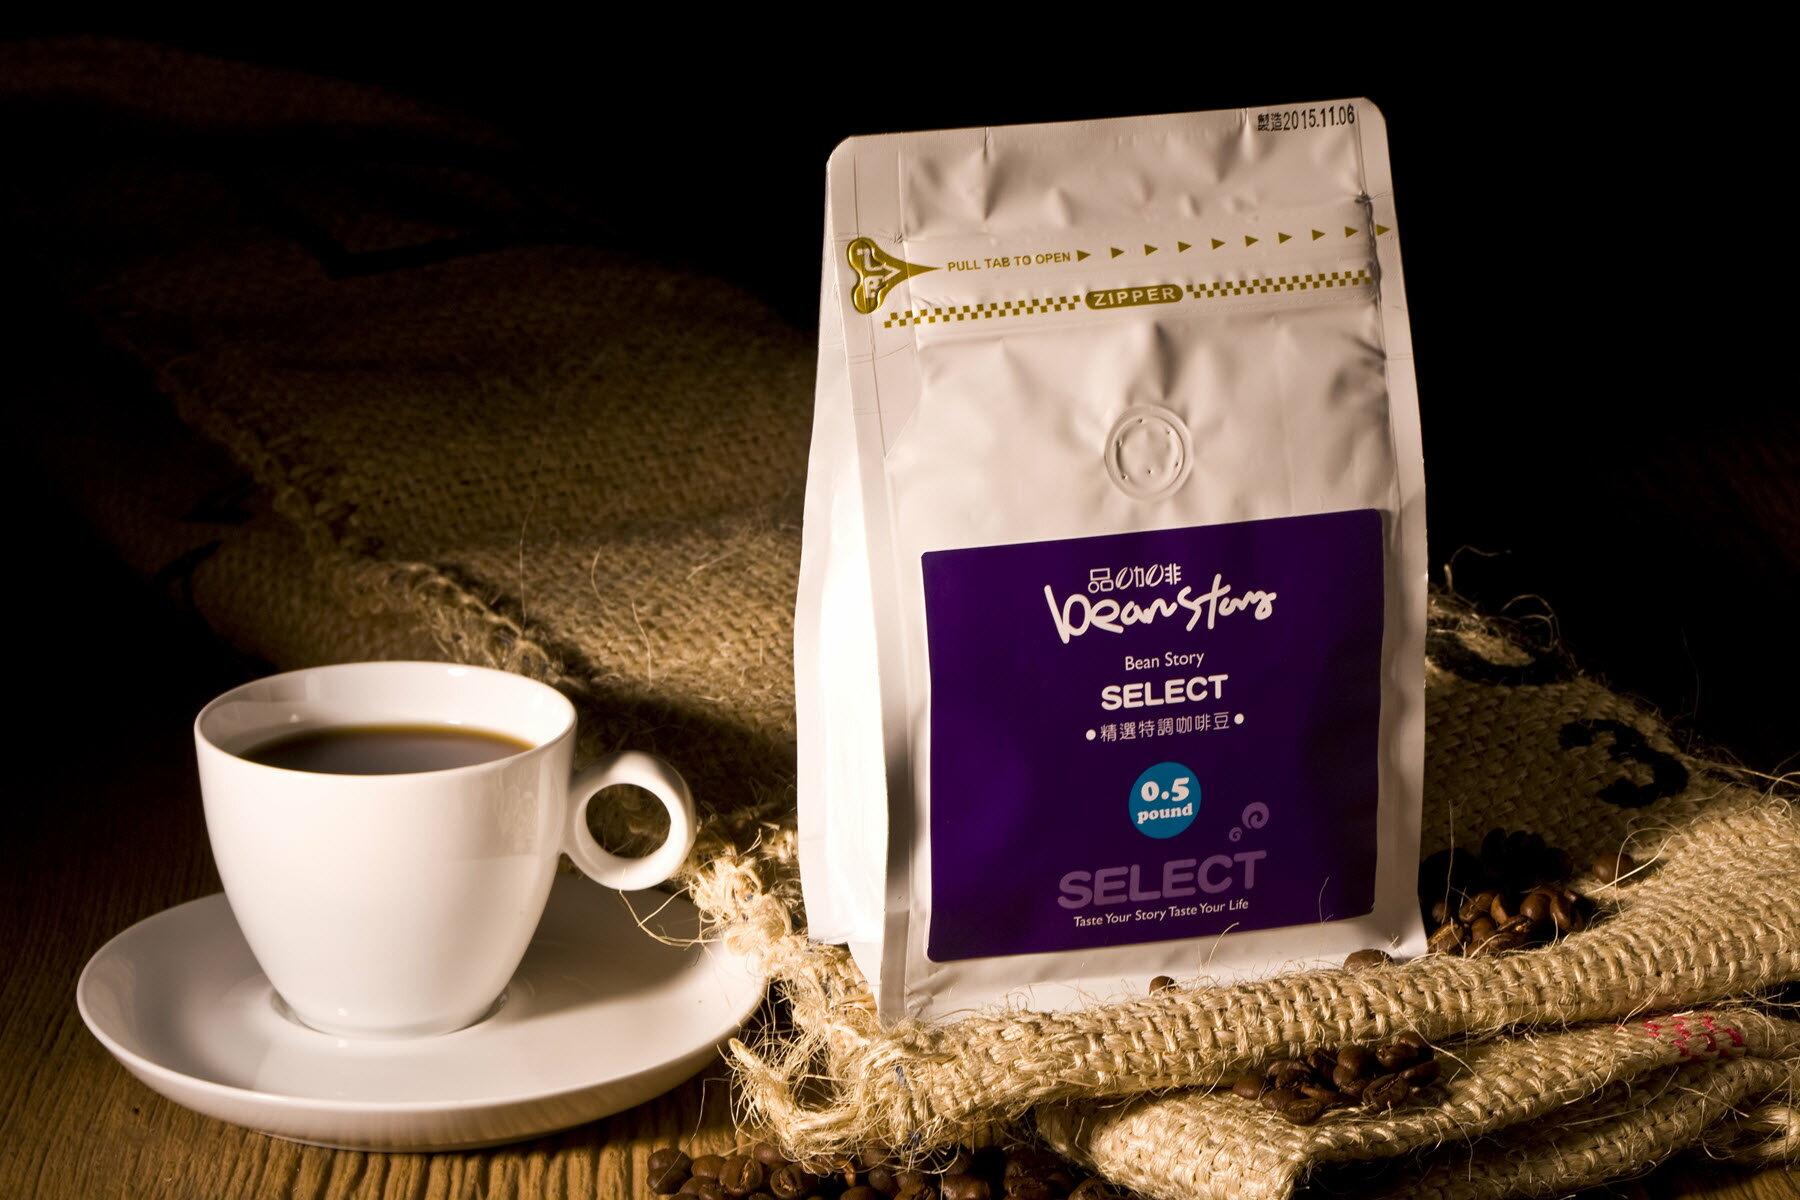 <br/><br/>  【經典咖啡促銷組合,邀您品嚐好咖啡】《品咖啡BeanStory》精選特調咖啡豆(半磅) x 2 + 品咖啡特調濾掛咖啡一盒<br/><br/>